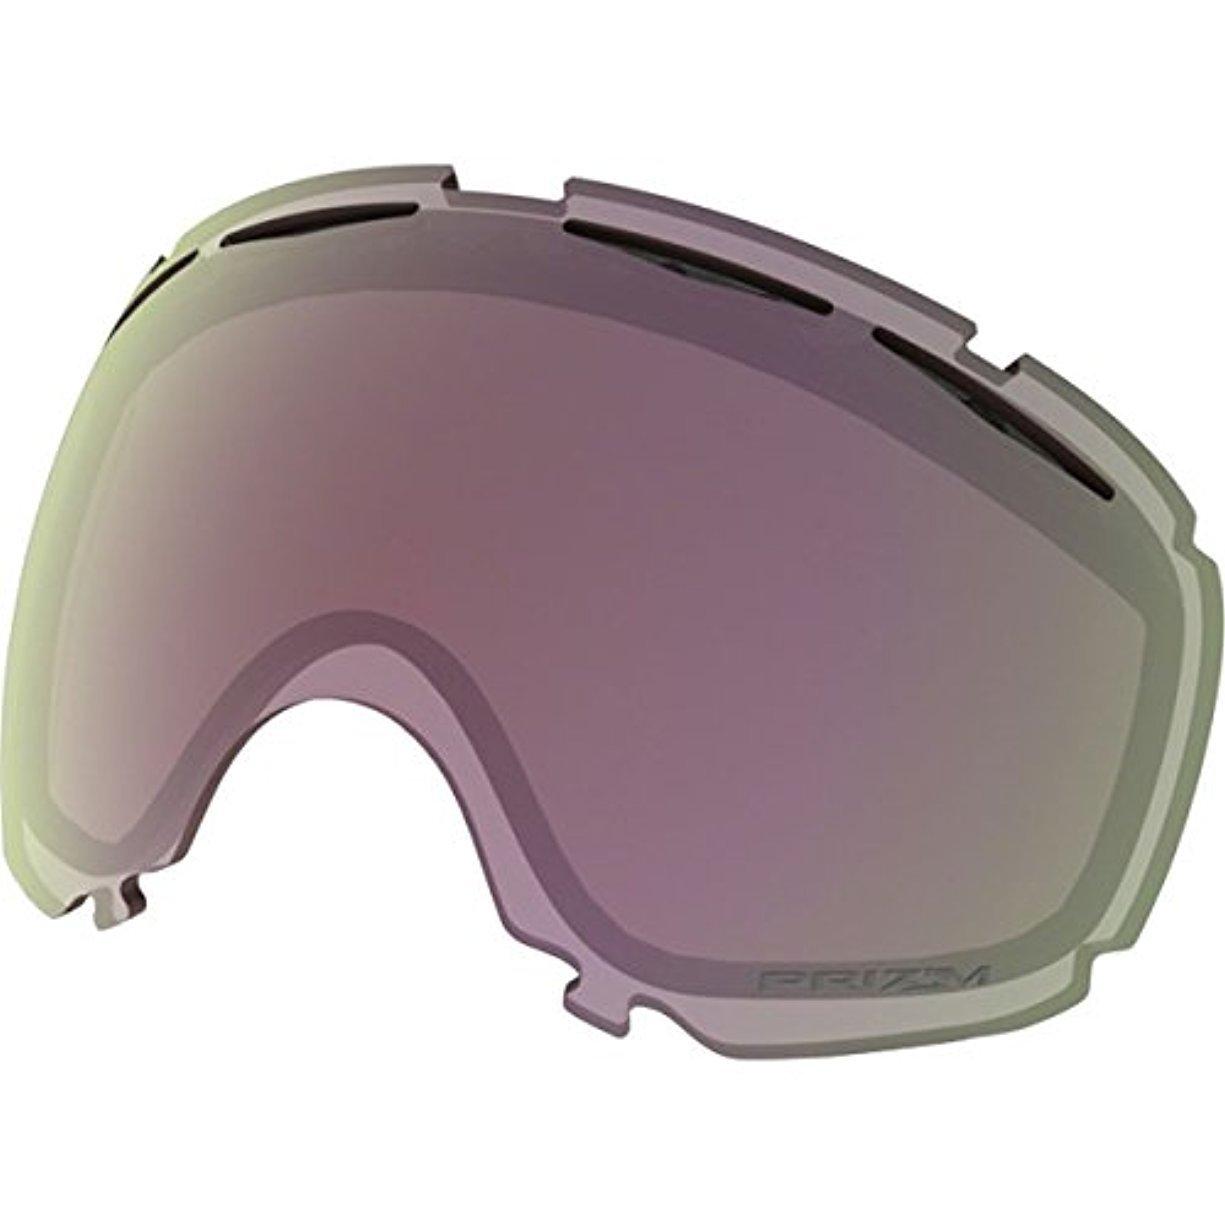 Oakley Canopy Accessory Lenses Prizm HI Pink & Cap Bundle by Oakley